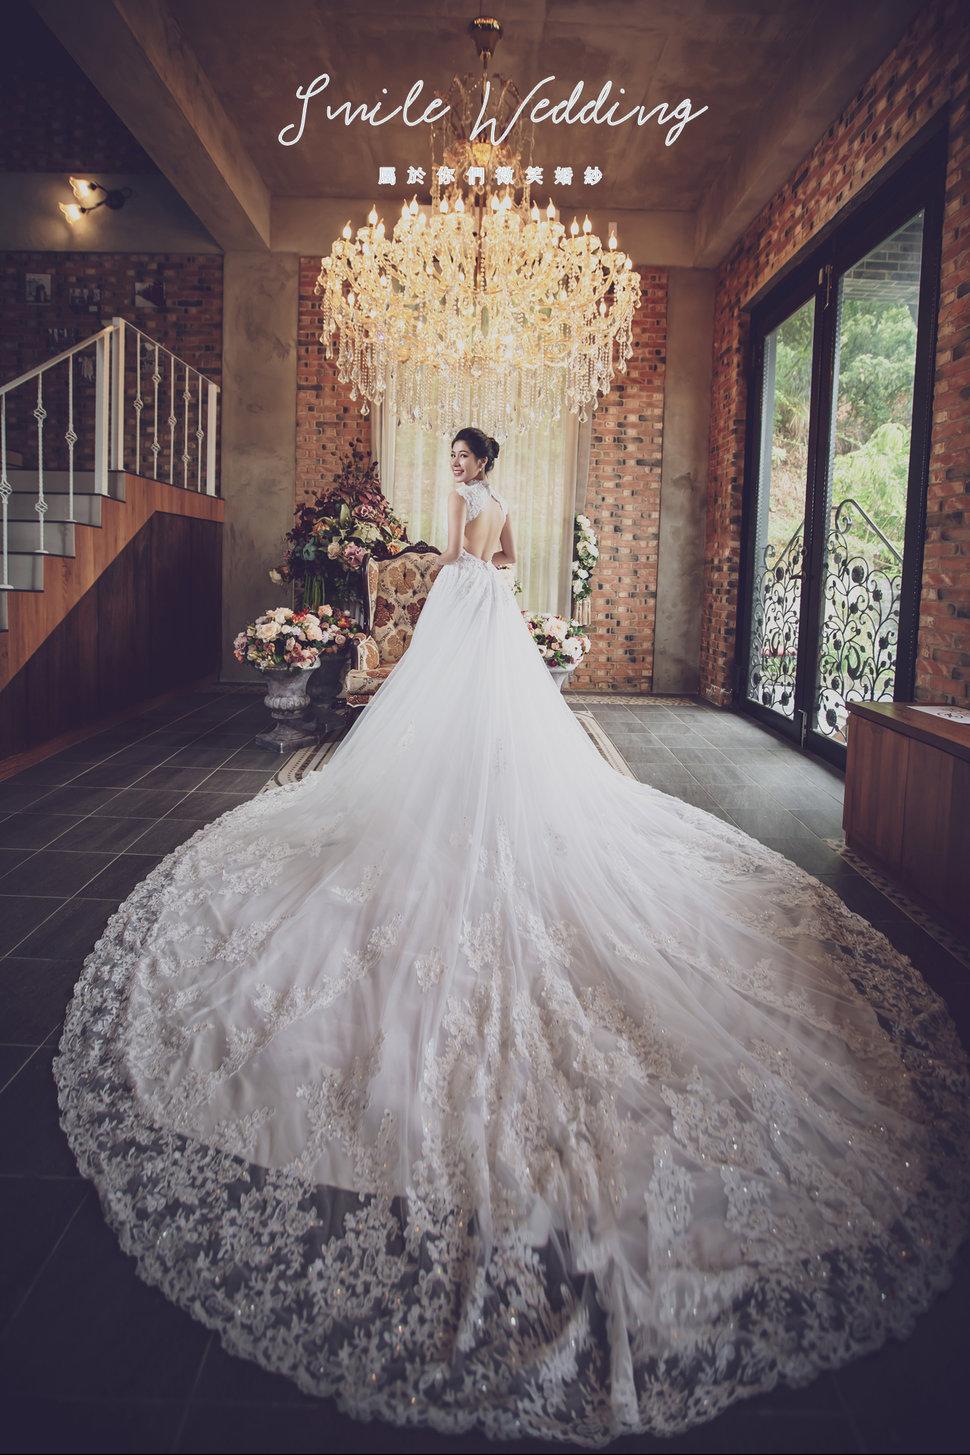 SIN_8436 - Smile wedding 微笑婚紗《結婚吧》